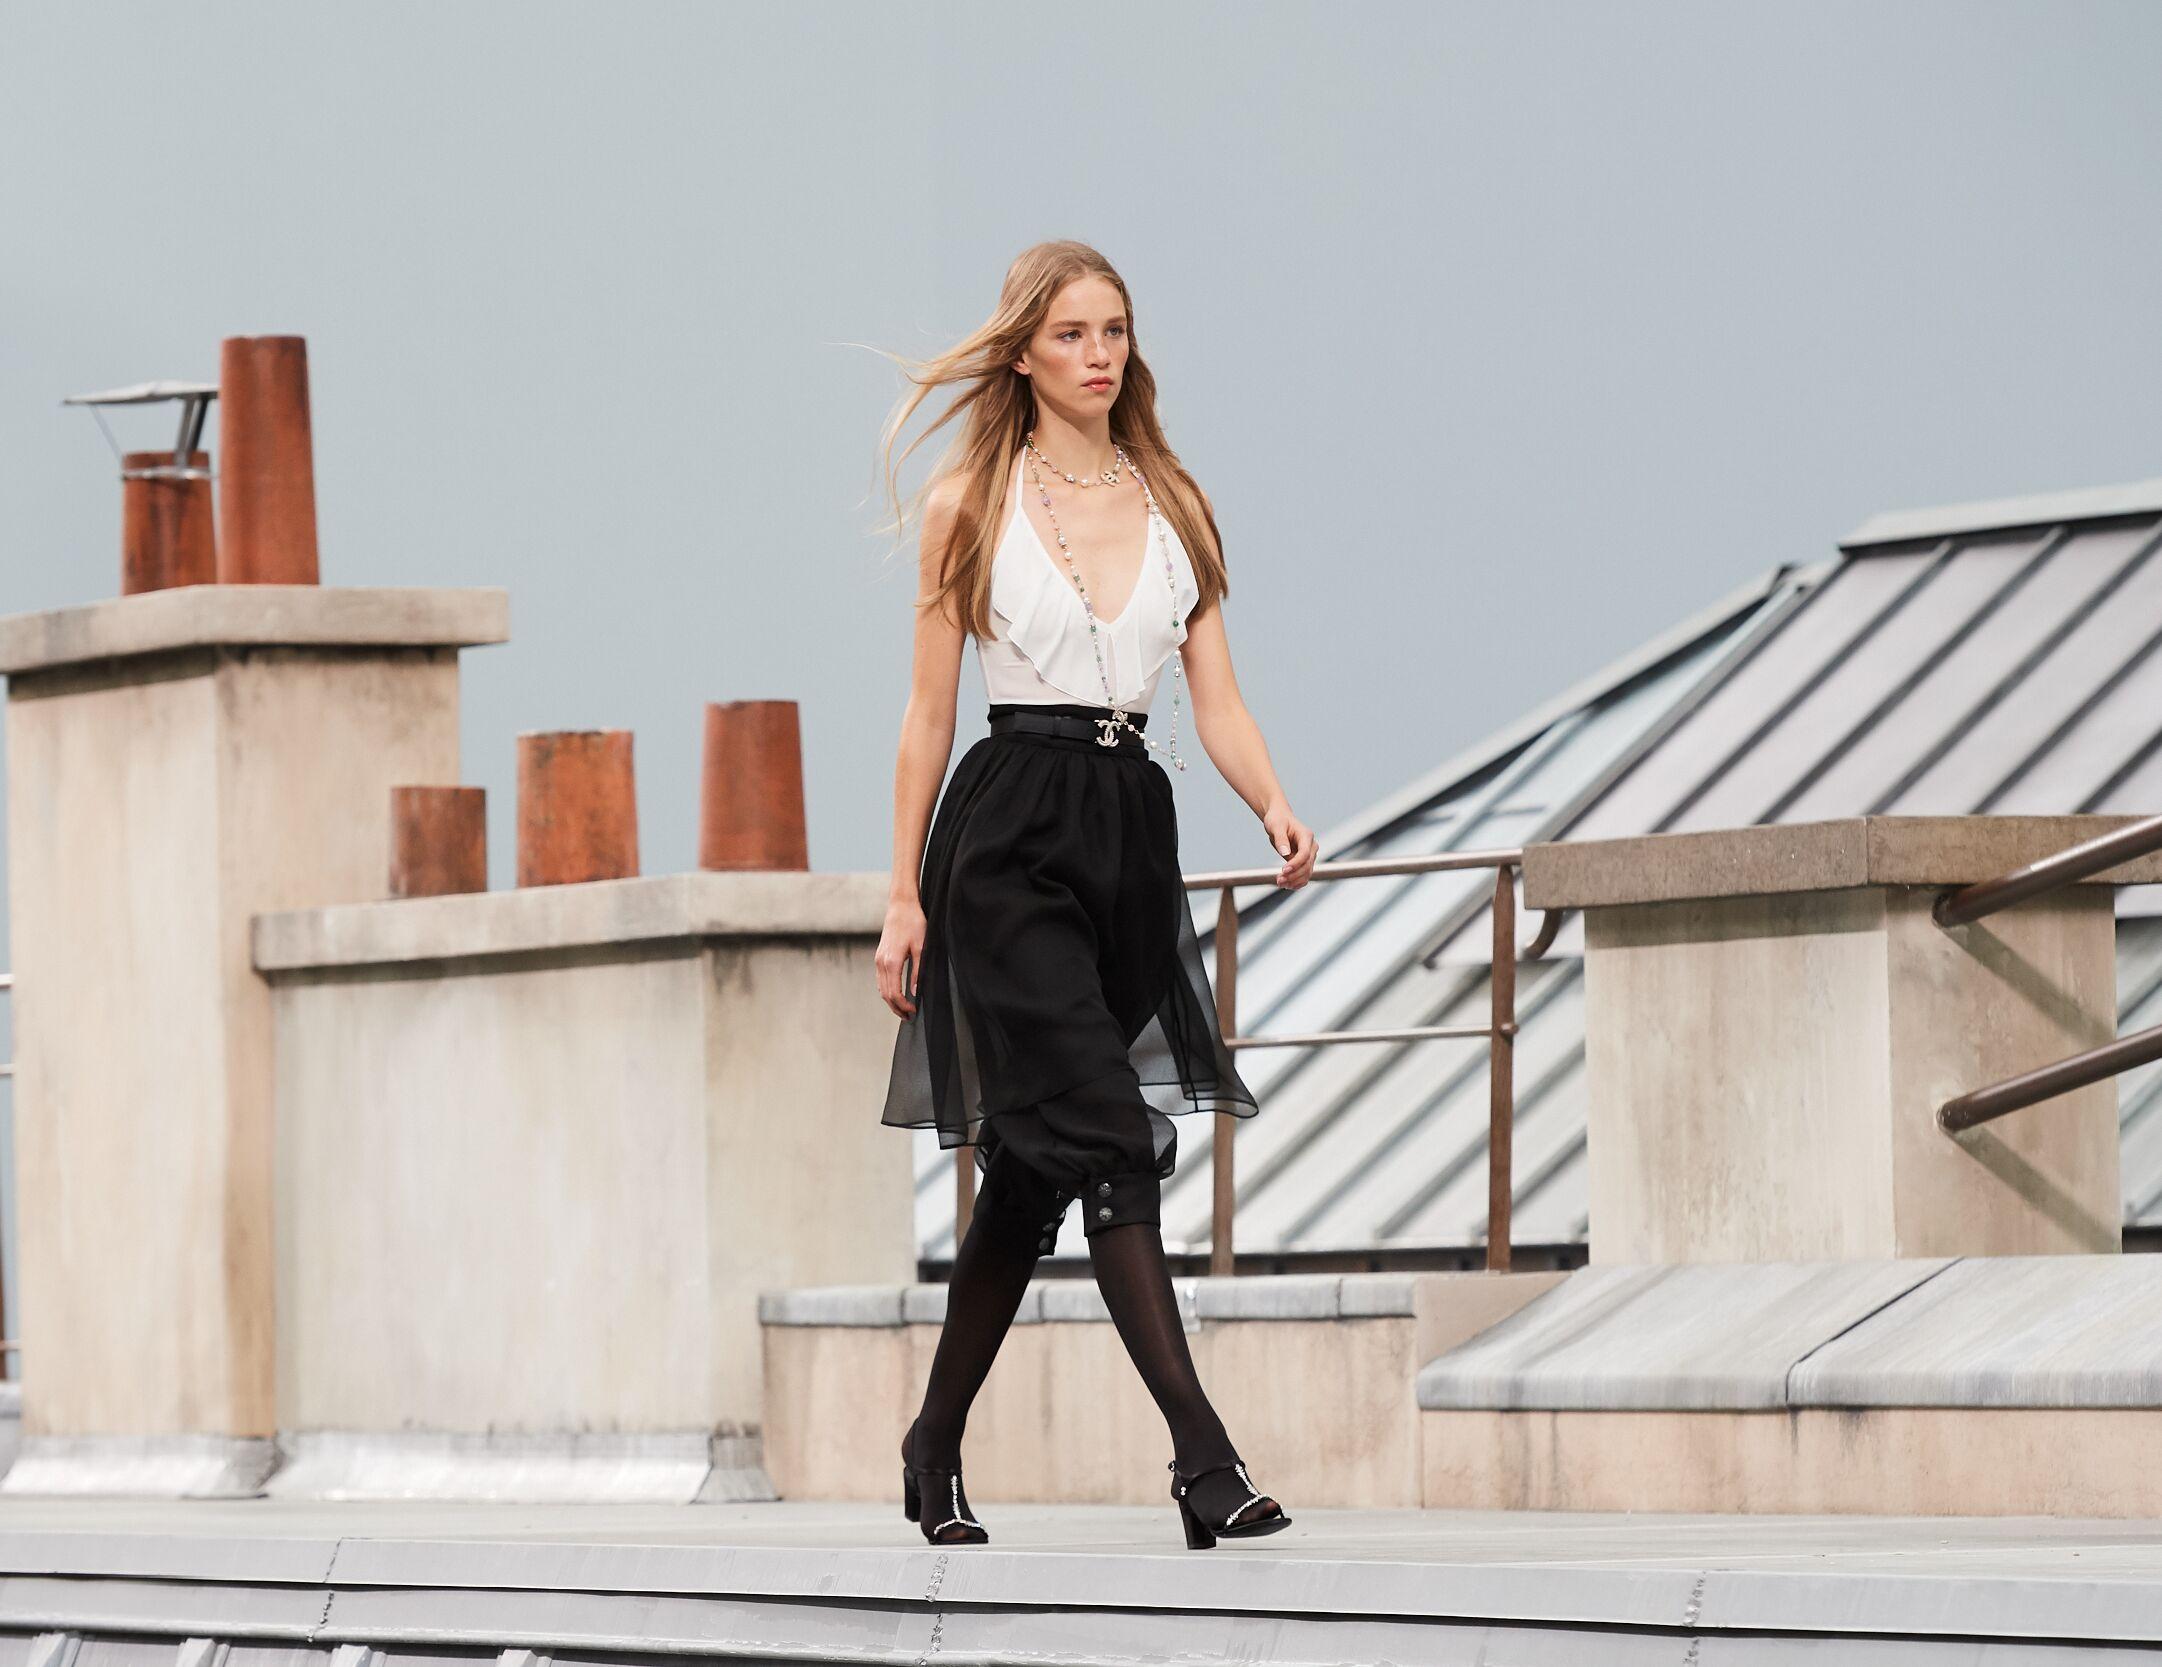 Model Fashion Week 2020 Catwalk Chanel